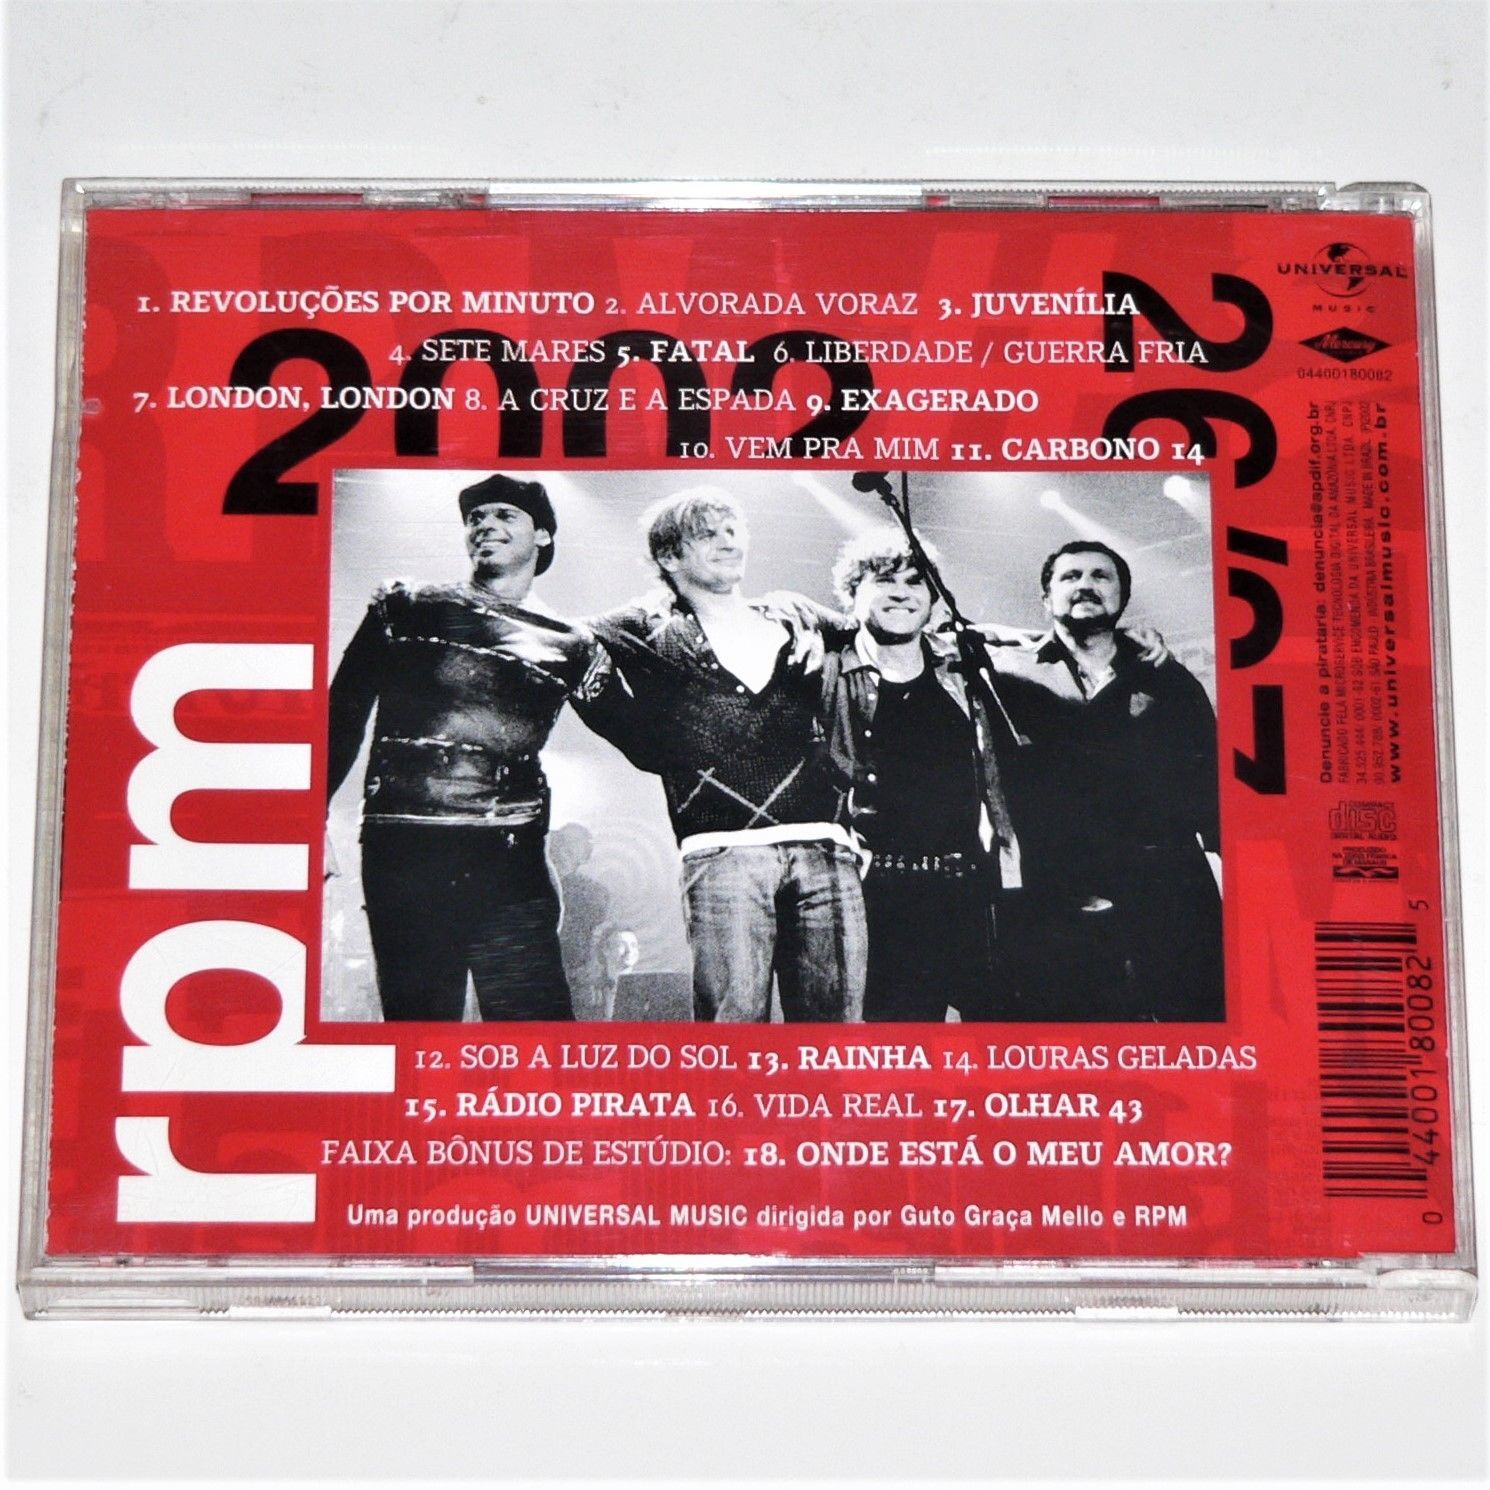 Amor Voraz rpm - radio pirata / mtv 2002 - 2 x cd and similar items